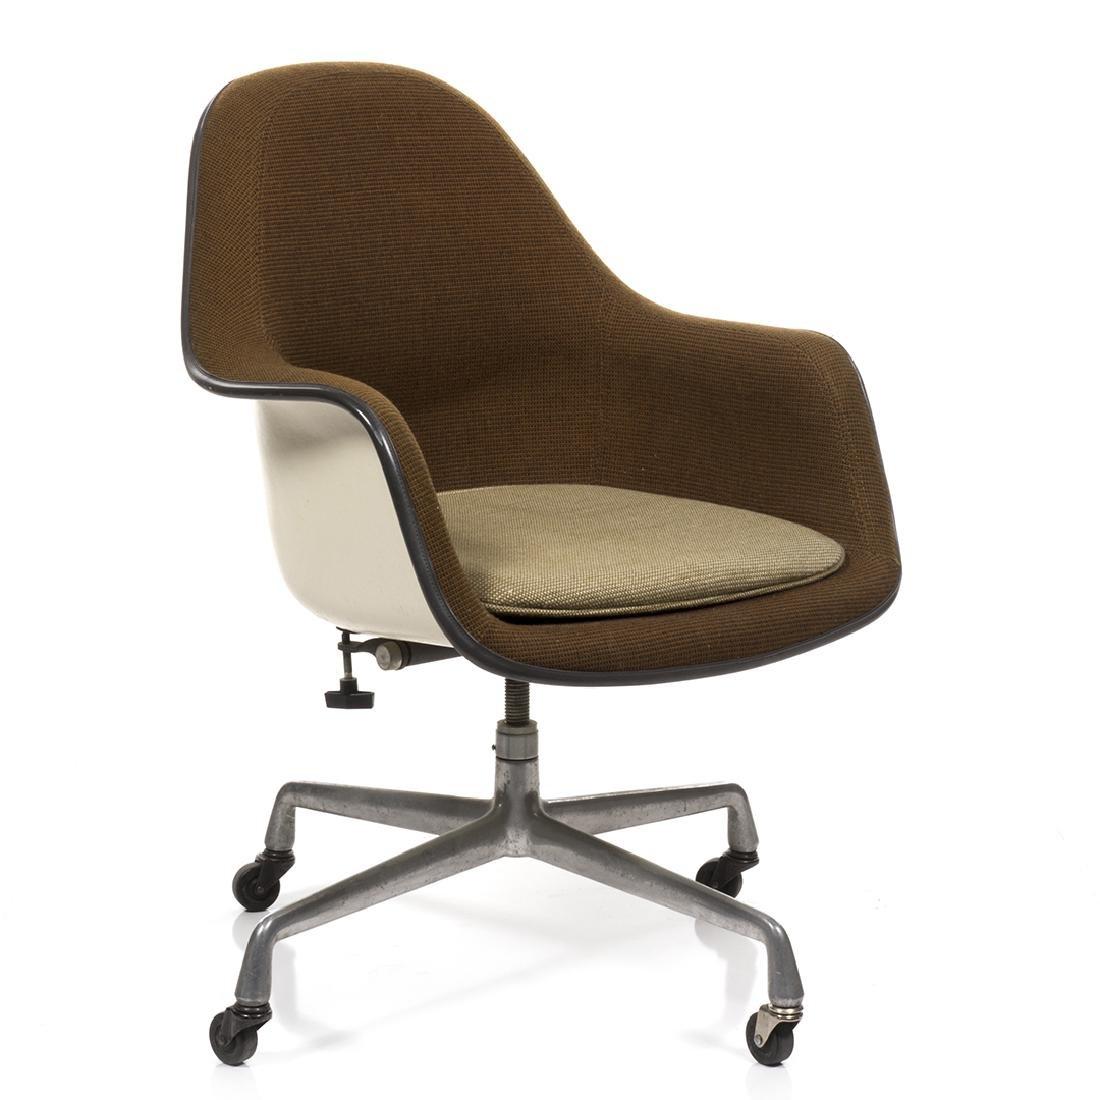 Charles Eames Executive Shell Chair - 3